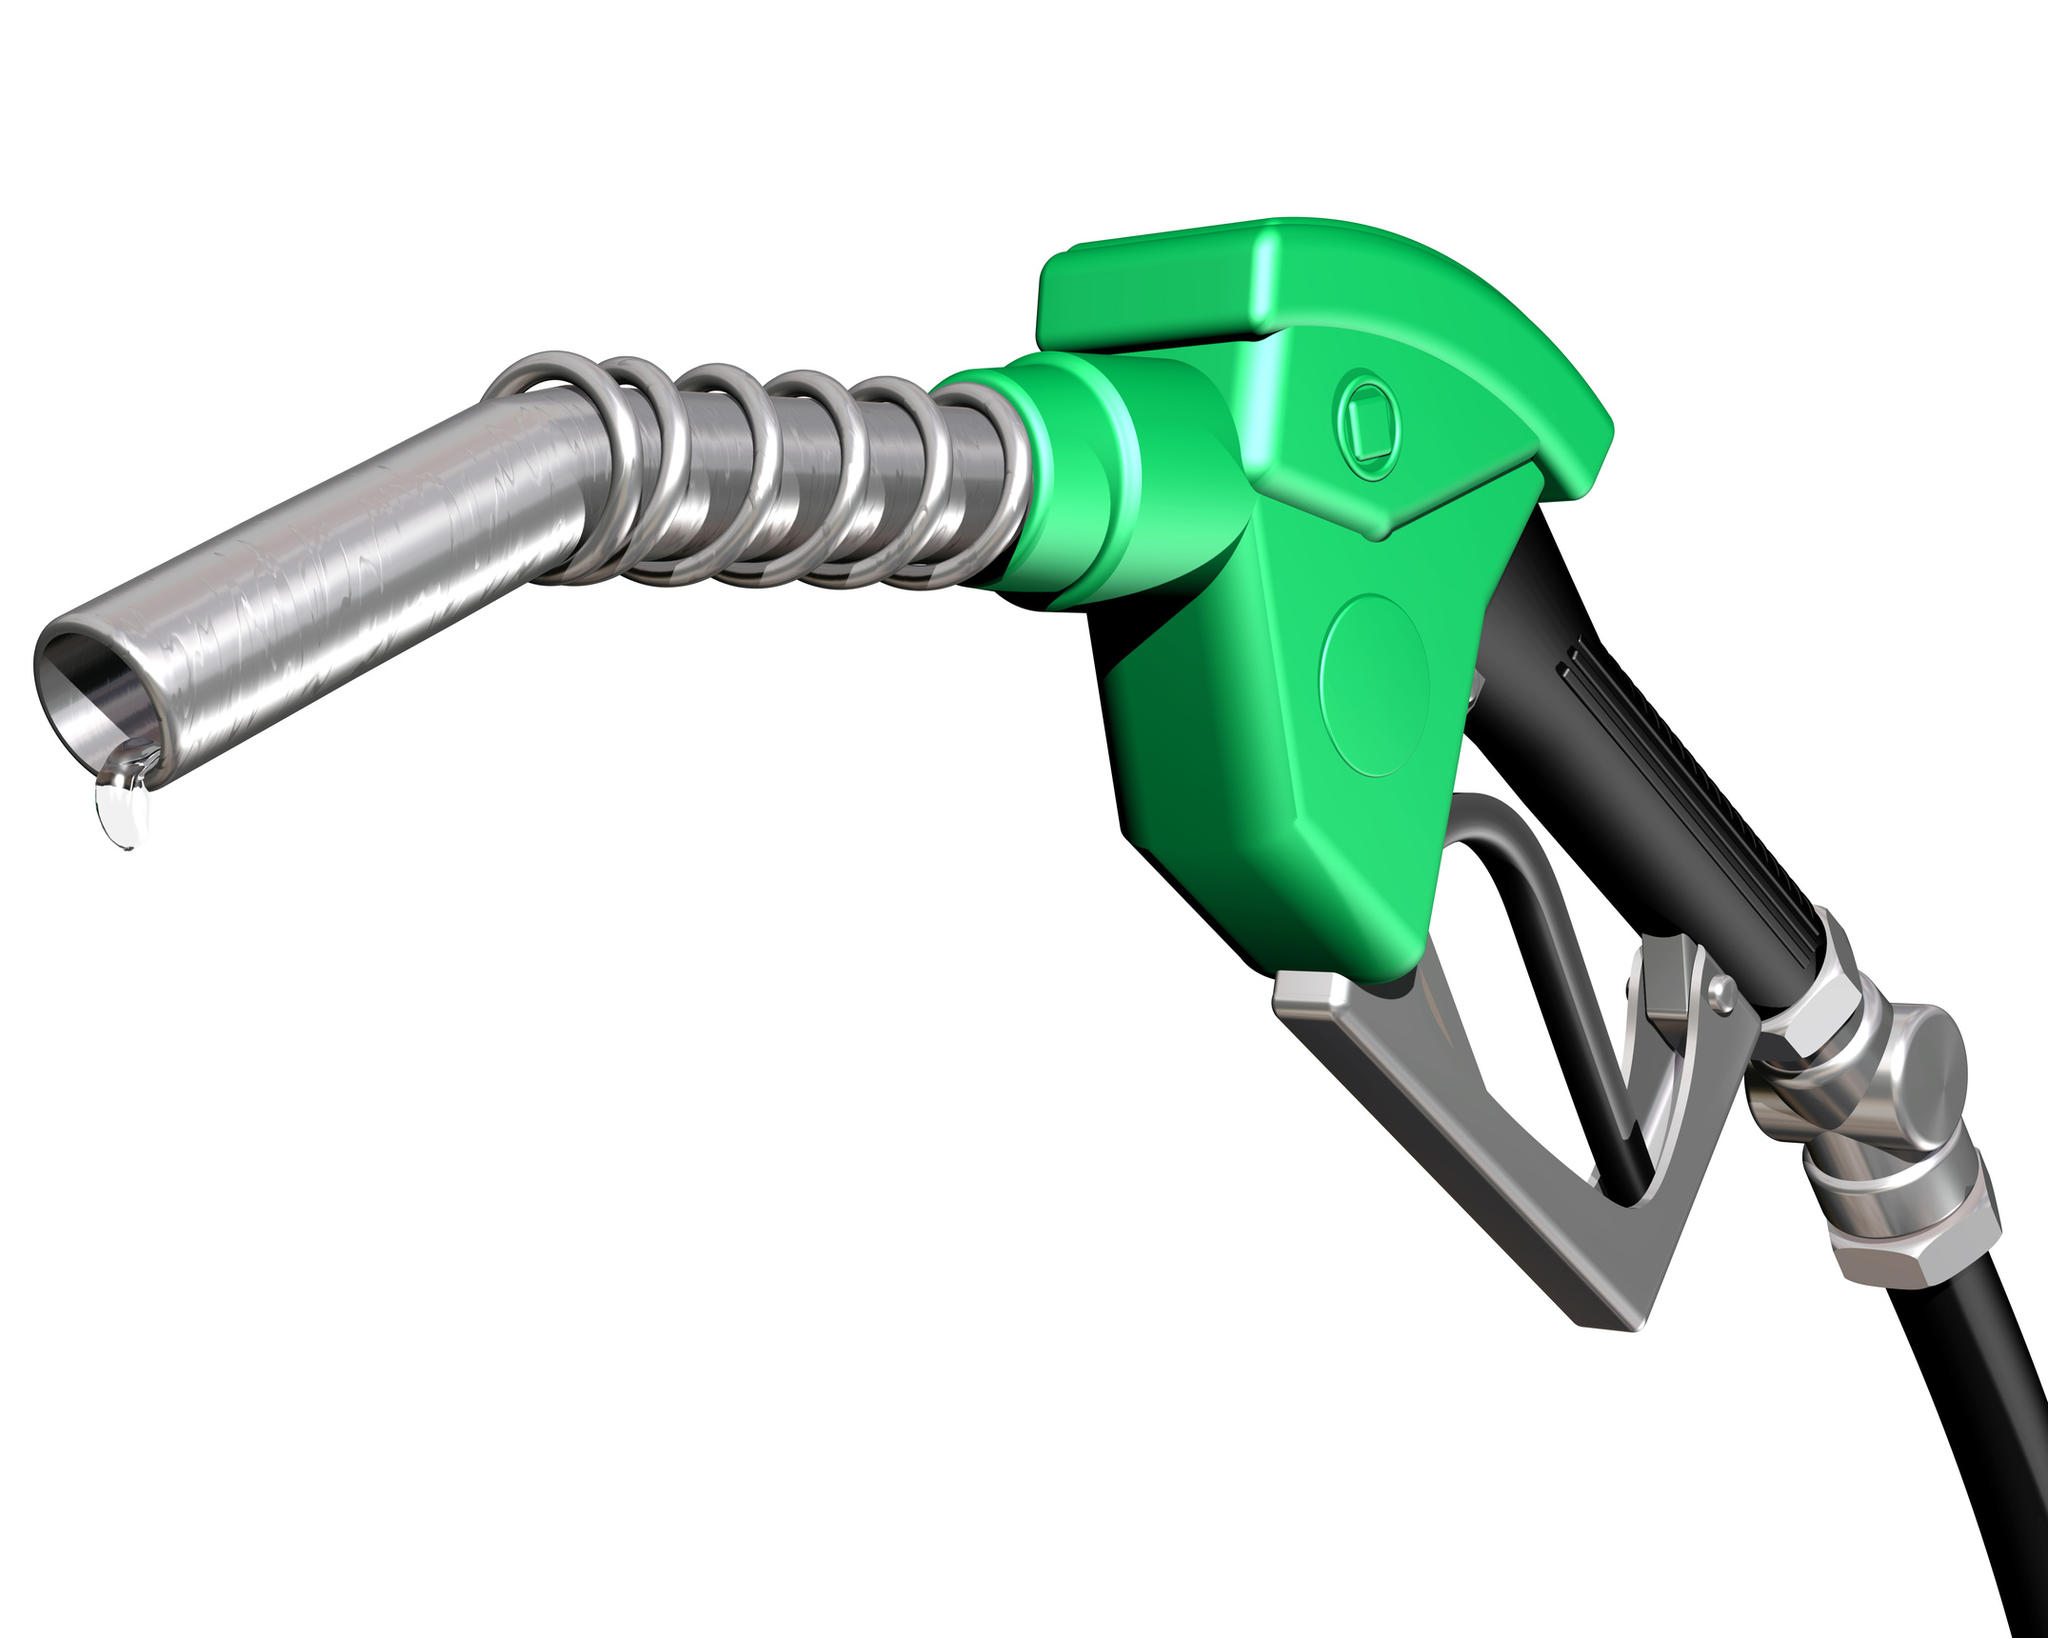 Petrol Pump Nozzle Royalty Free Stock Image - Image: 27078426